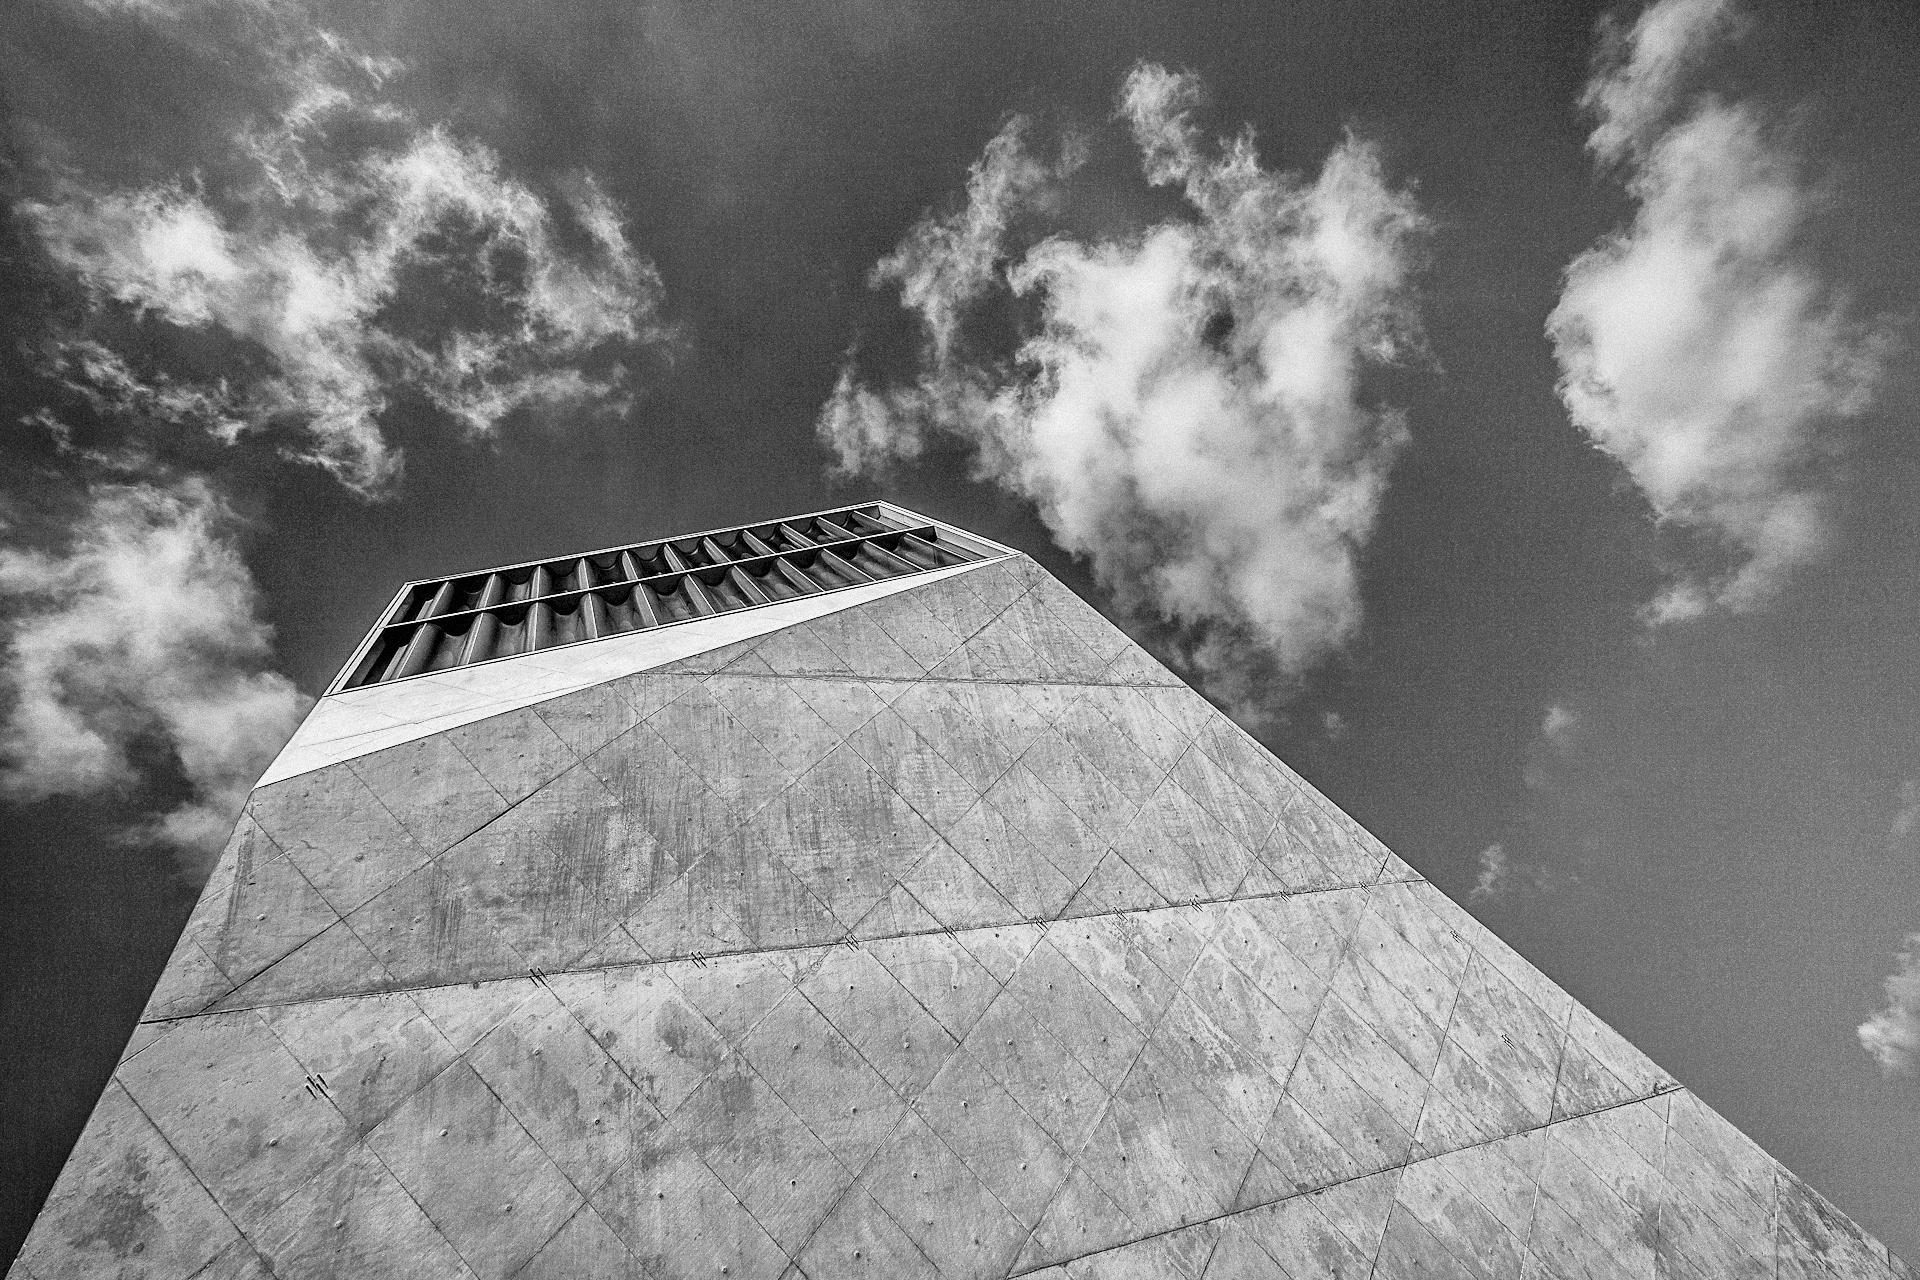 10-Aniversario-Casa-da-Musica-Porto-Reportagem-Fotografica-Photographic-Coverage-Fotografia-Photography-Arquitectura-Architecture-Rem-Koolhaas-bonjourmolotov-39N.jpg